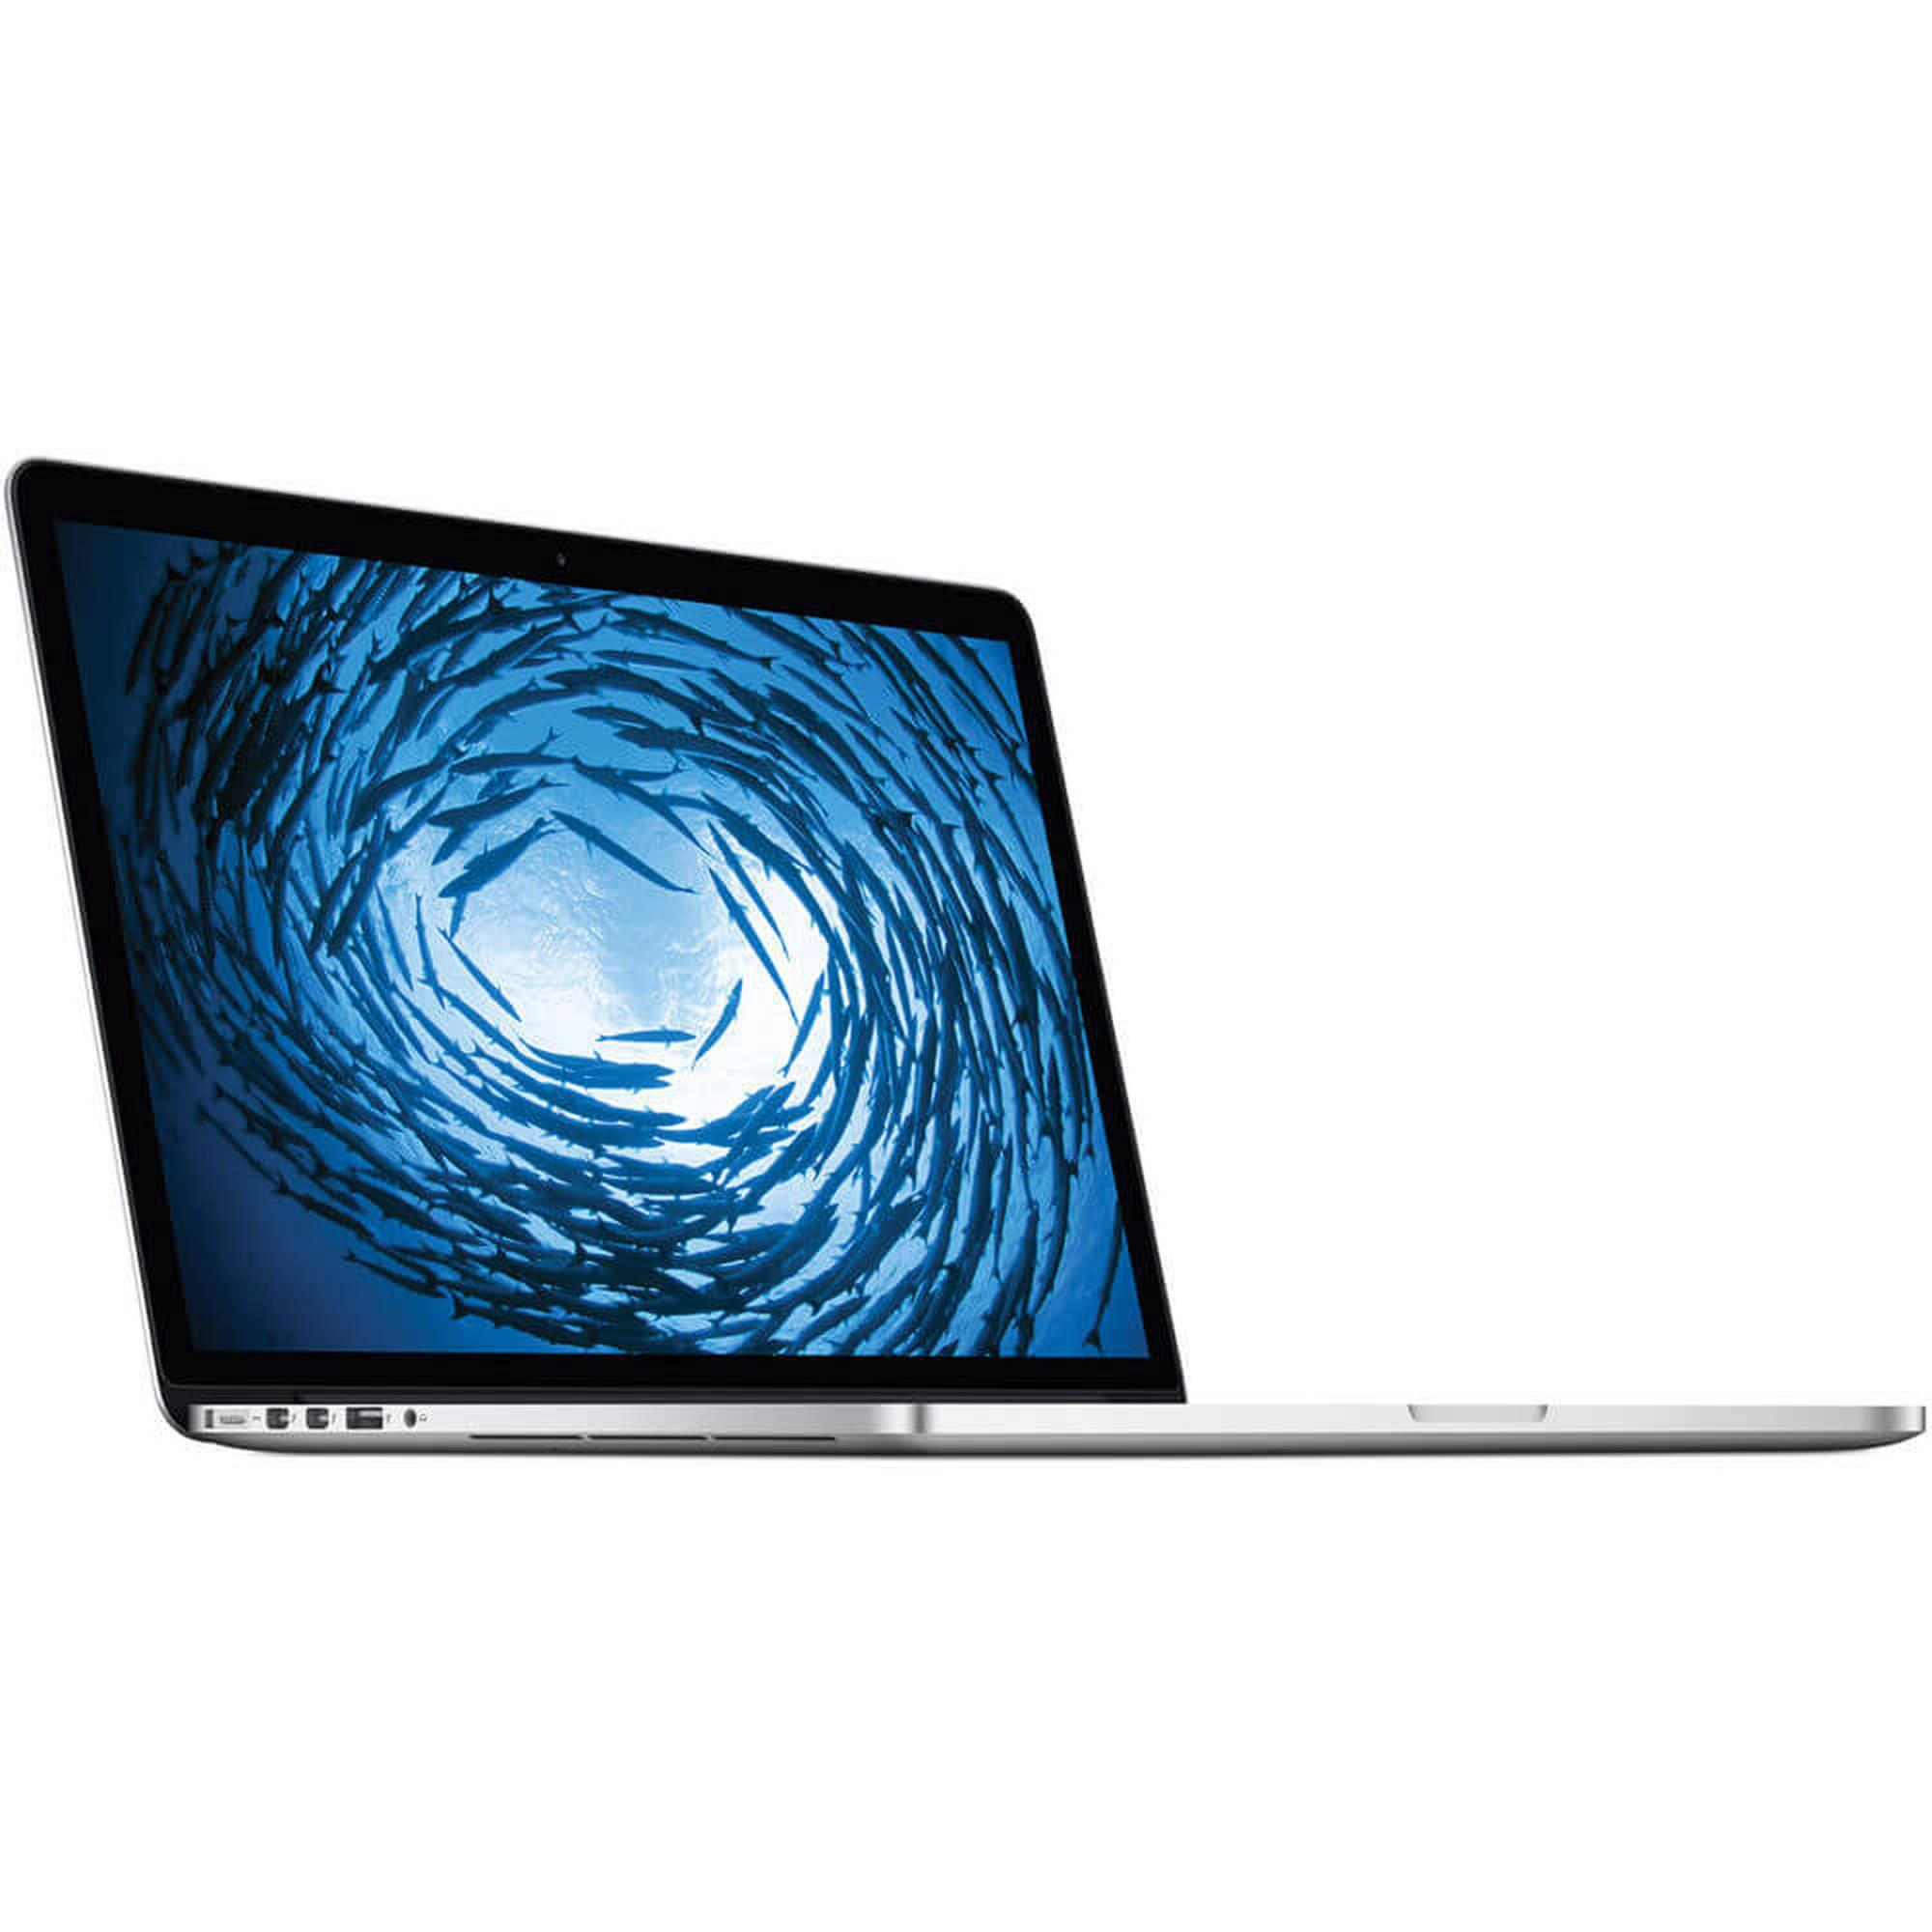 "MacBook Pro 15"" Retina (2015) - Core i7 2,2 GHz - SSD 512 GB - 16GB - teclado español"